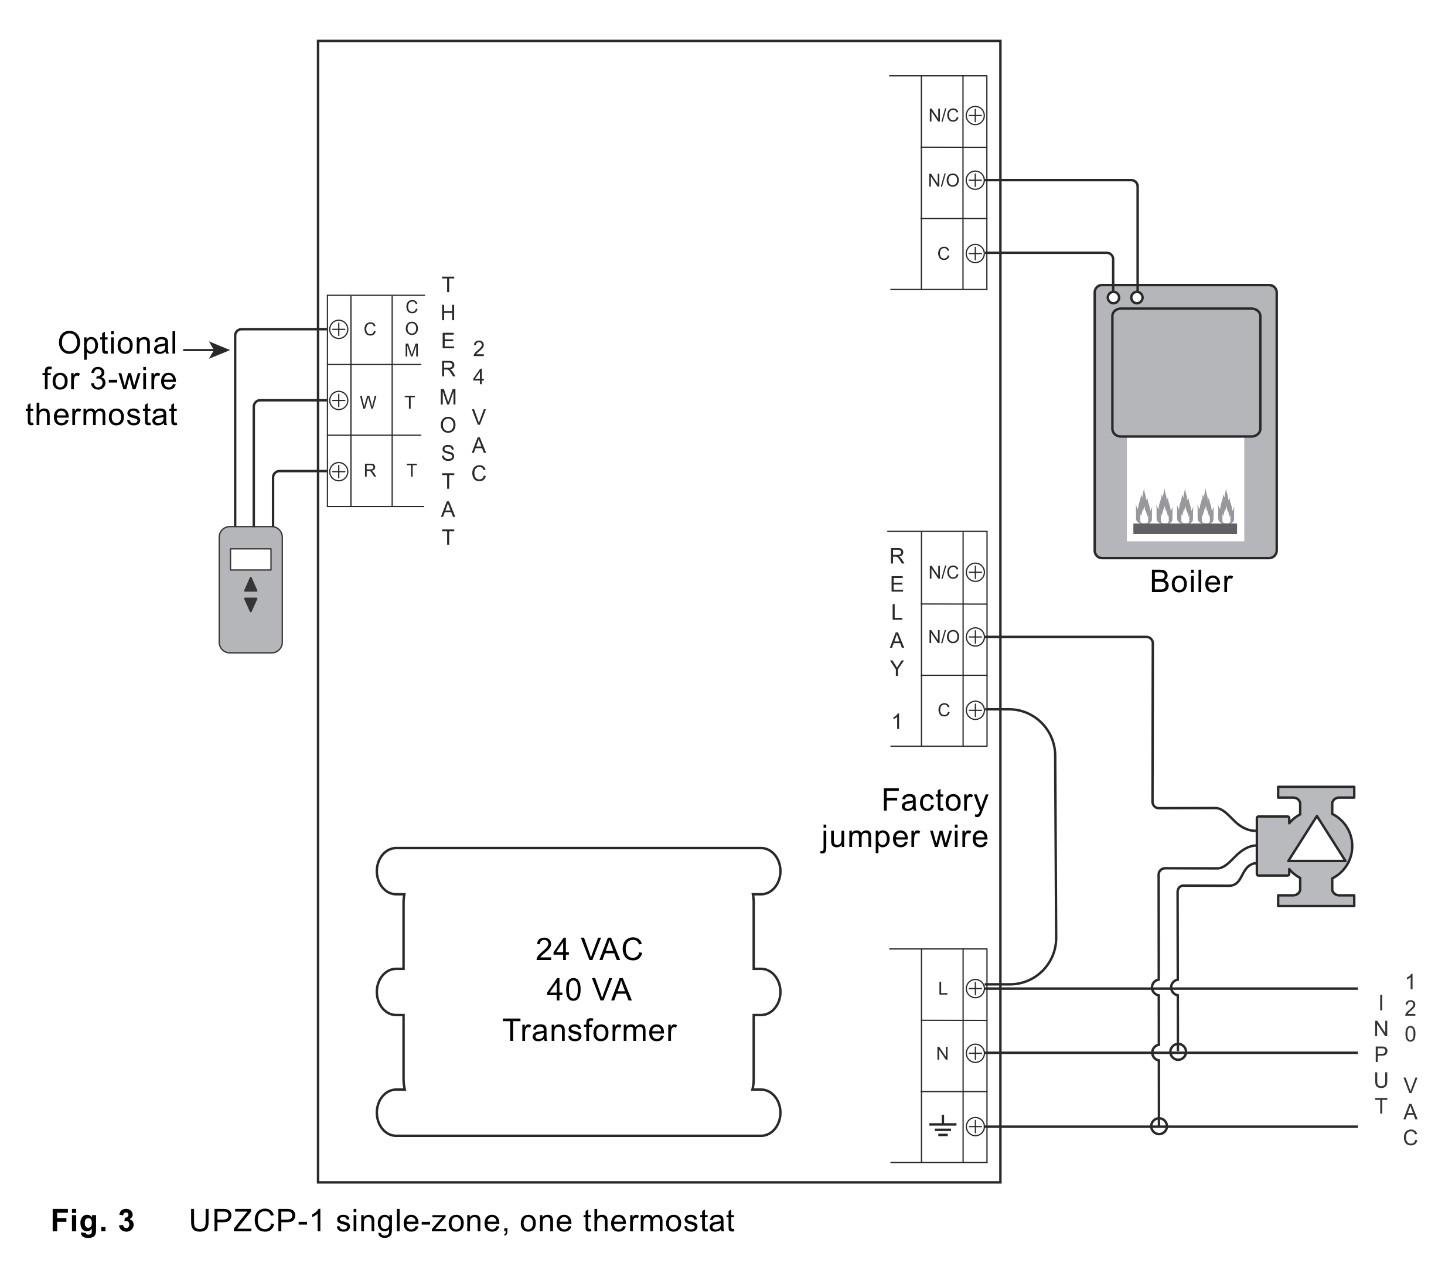 hight resolution of shop vac switch wiring diagram new wiring diagram image rh mainetreasurechest com craftsman